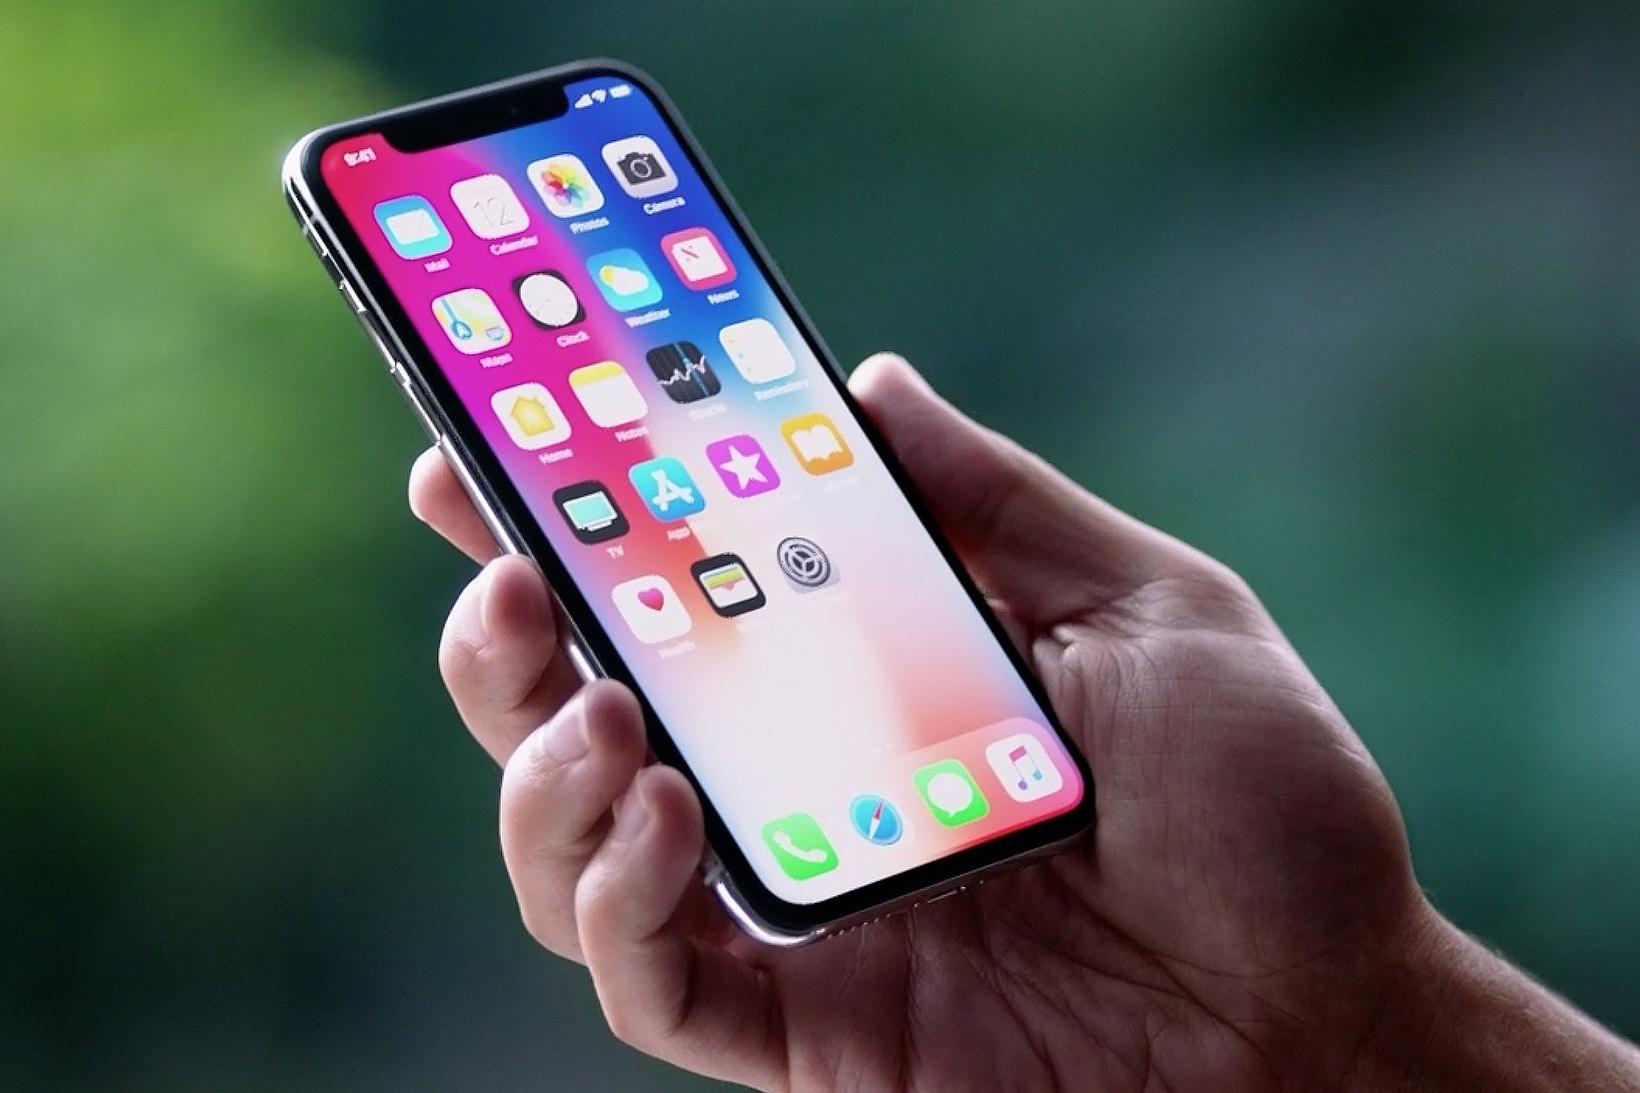 Brazillian release of iPhone X will cost over 2150 bucks